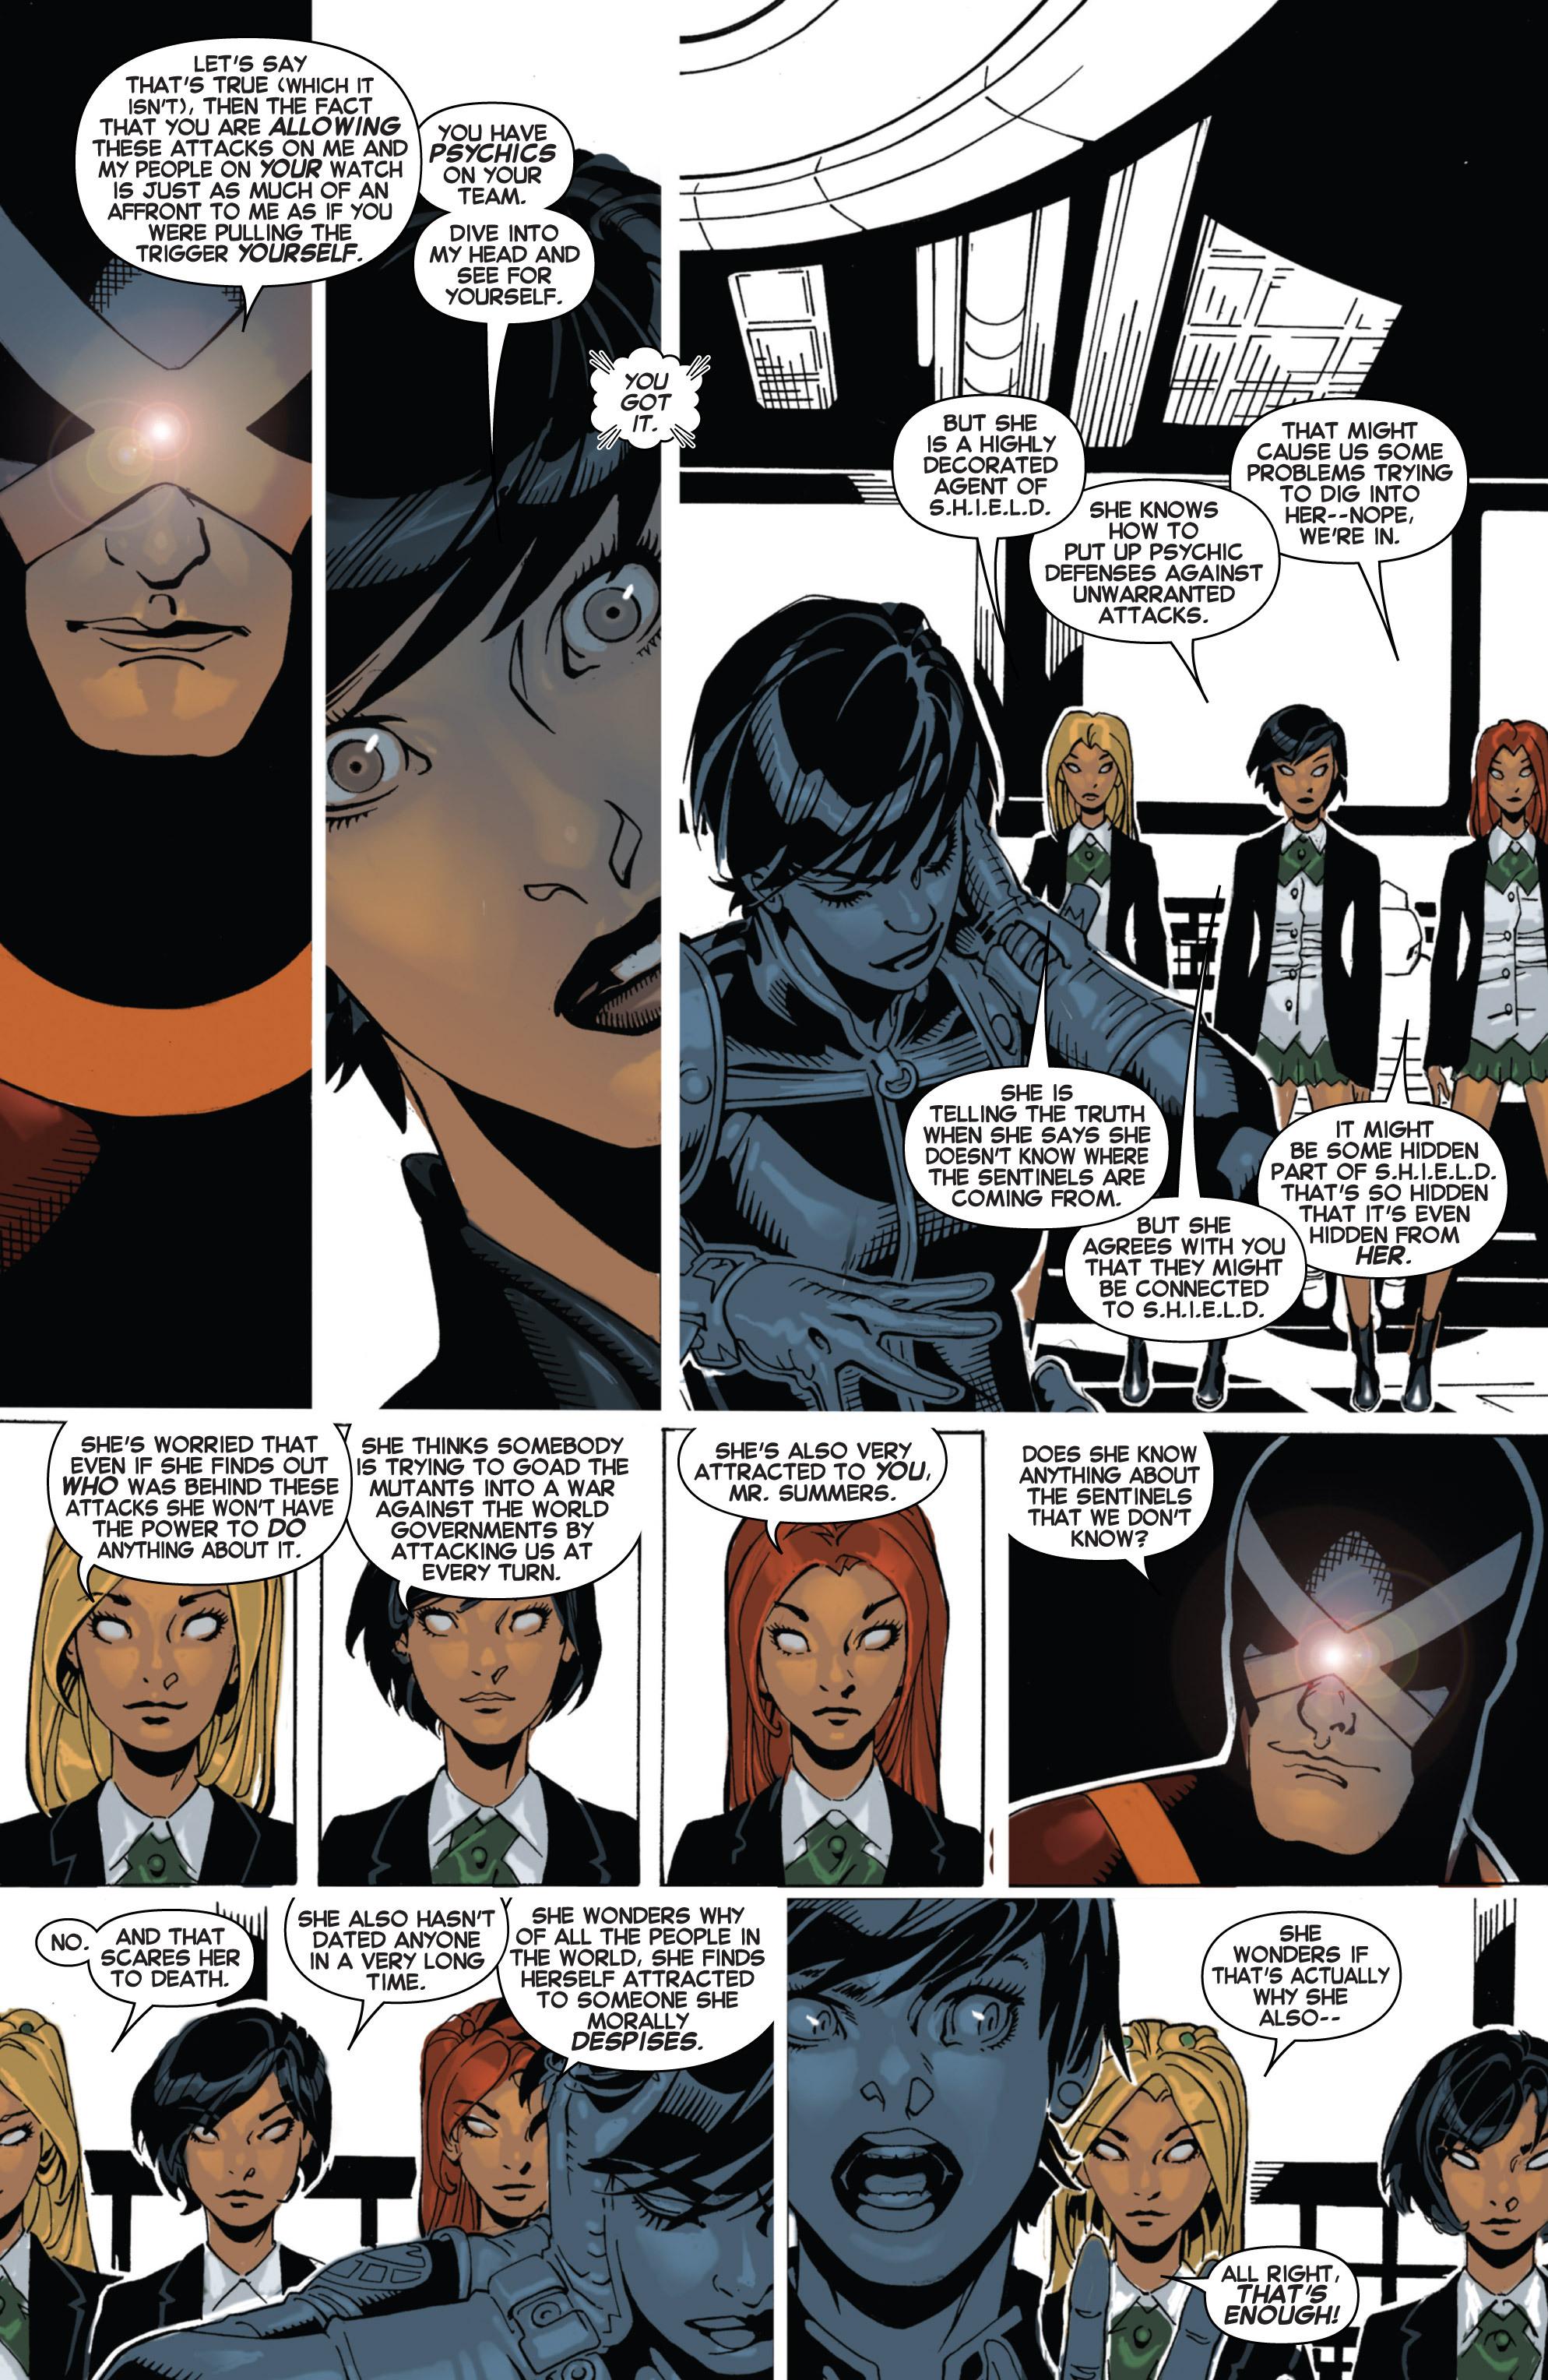 Read online Uncanny X-Men (2013) comic -  Issue # _TPB 4 - vs. S.H.I.E.L.D - 26